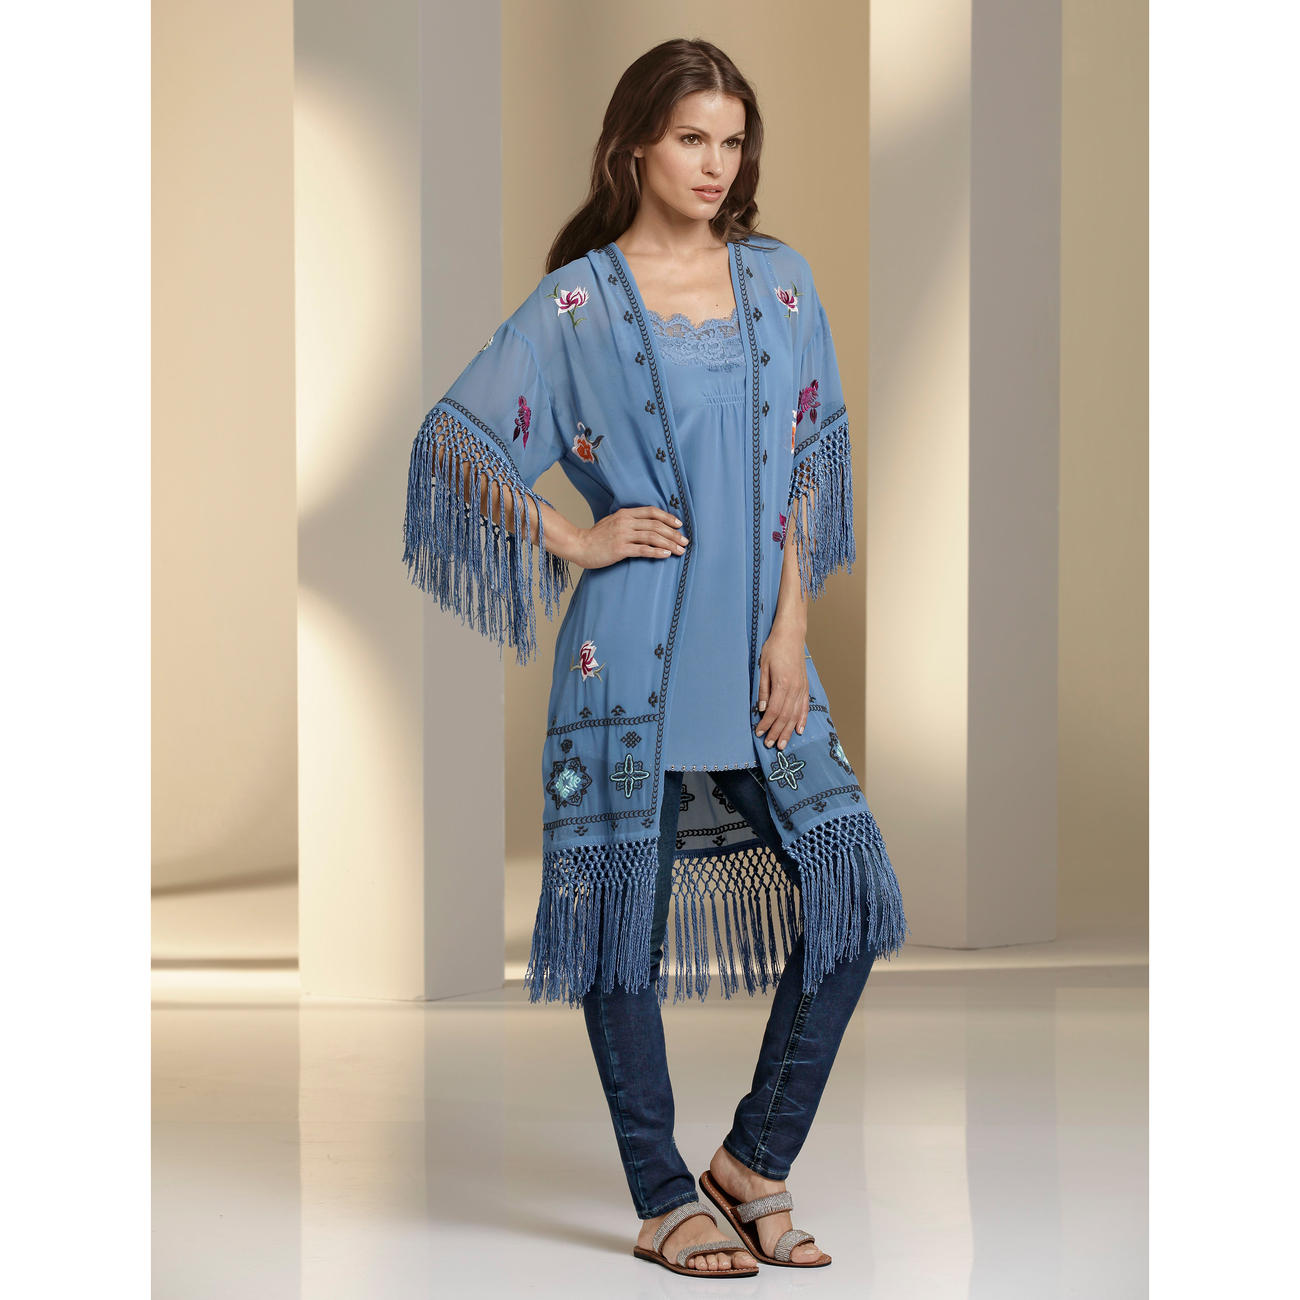 twinset lingerie tunika oder kimono mantel style booster kimono mantel bei - Mantel Der Ideen Mit Uhr Verziert